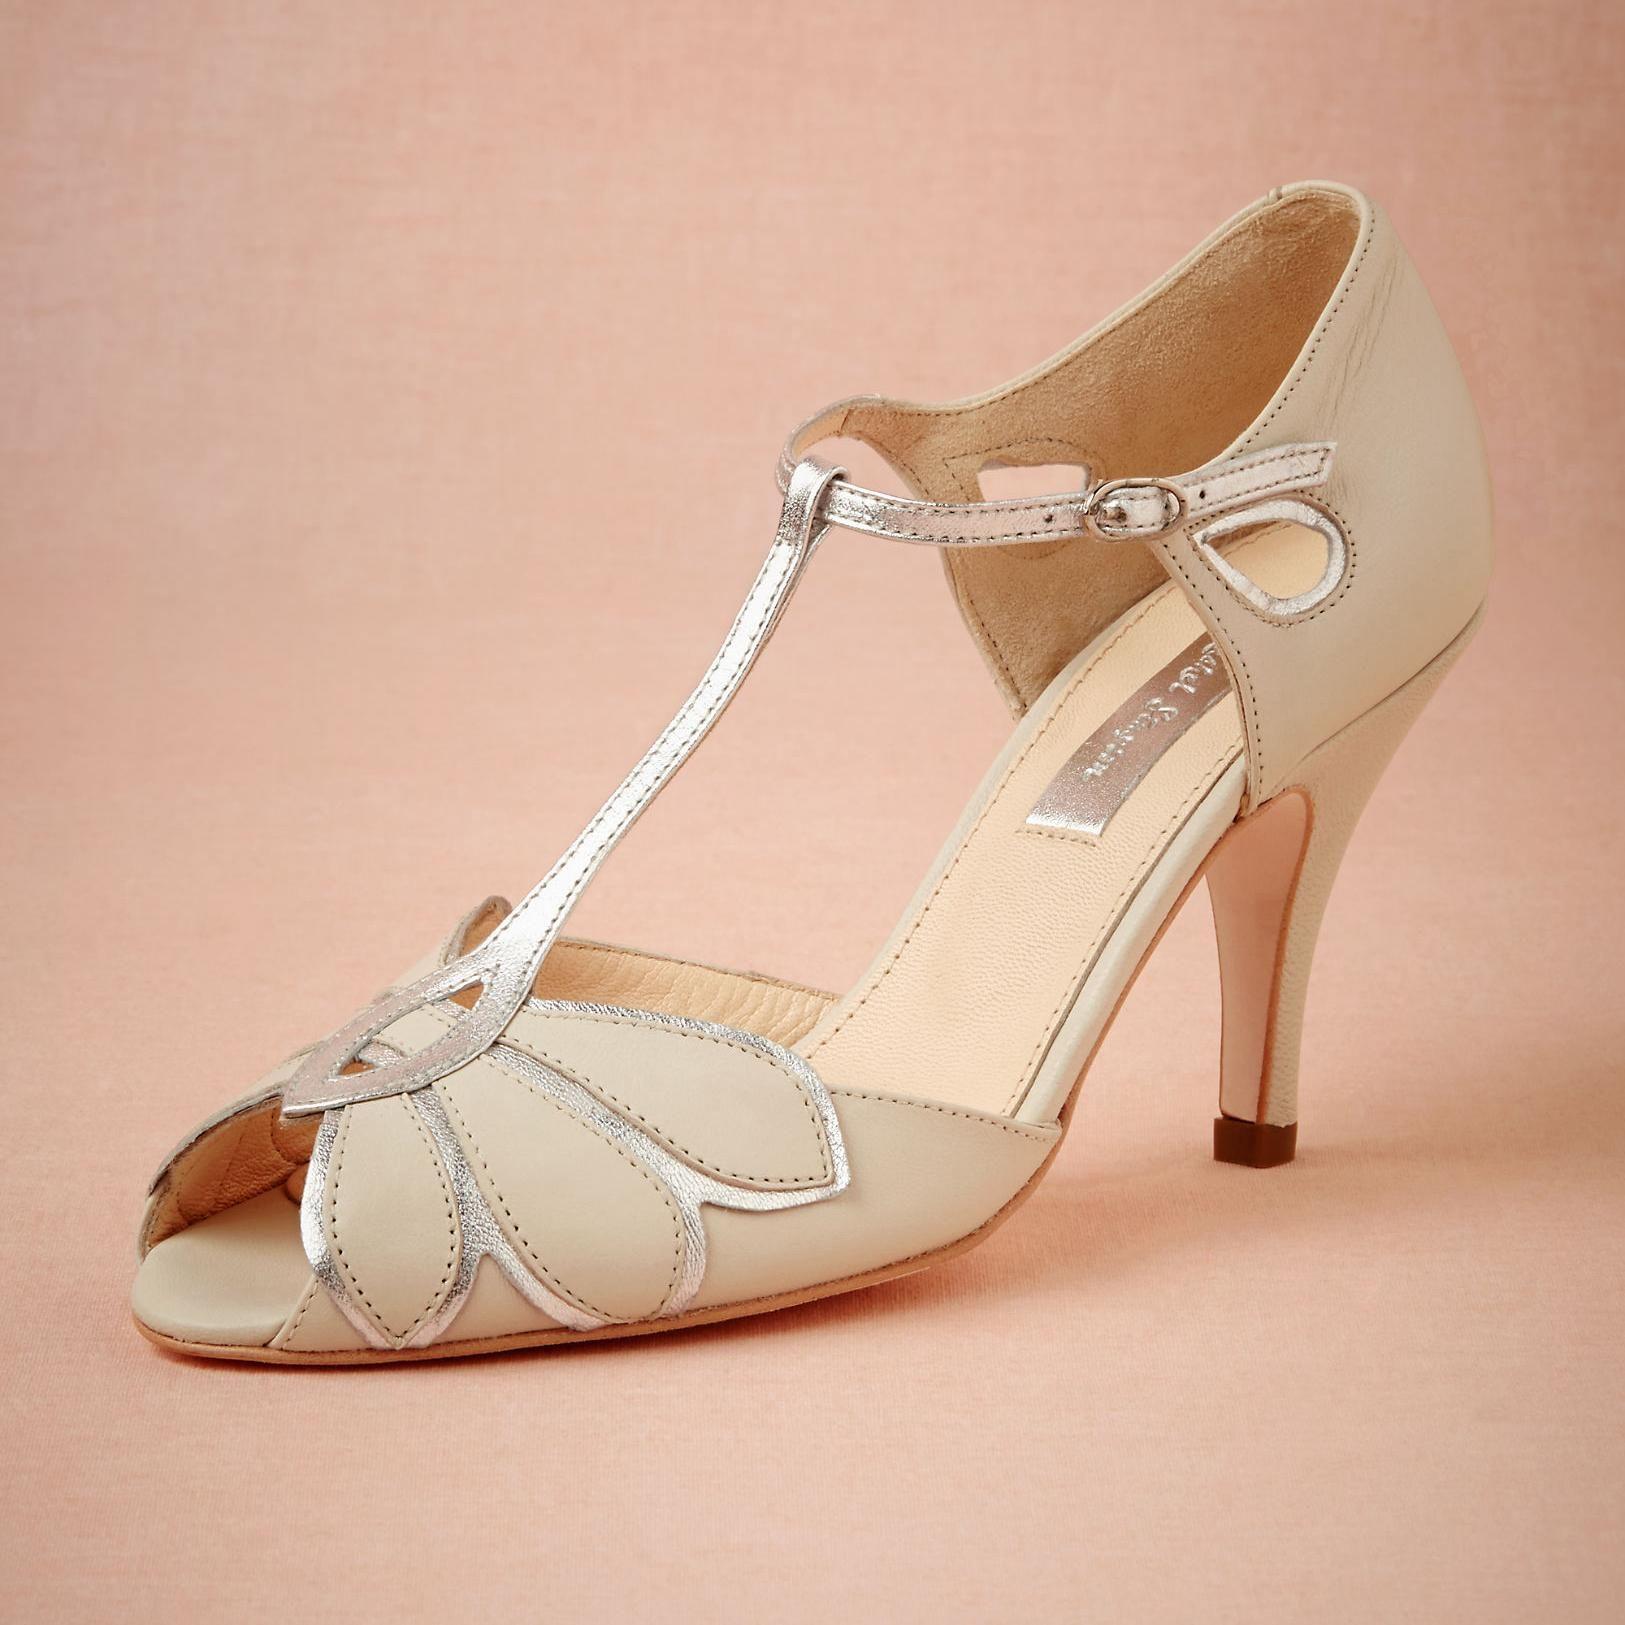 vintage ivory wedding shoes wedding pumps mimosa t straps buckle closure leather party dance 3 high heels women sandals short wedding boots flat wedding